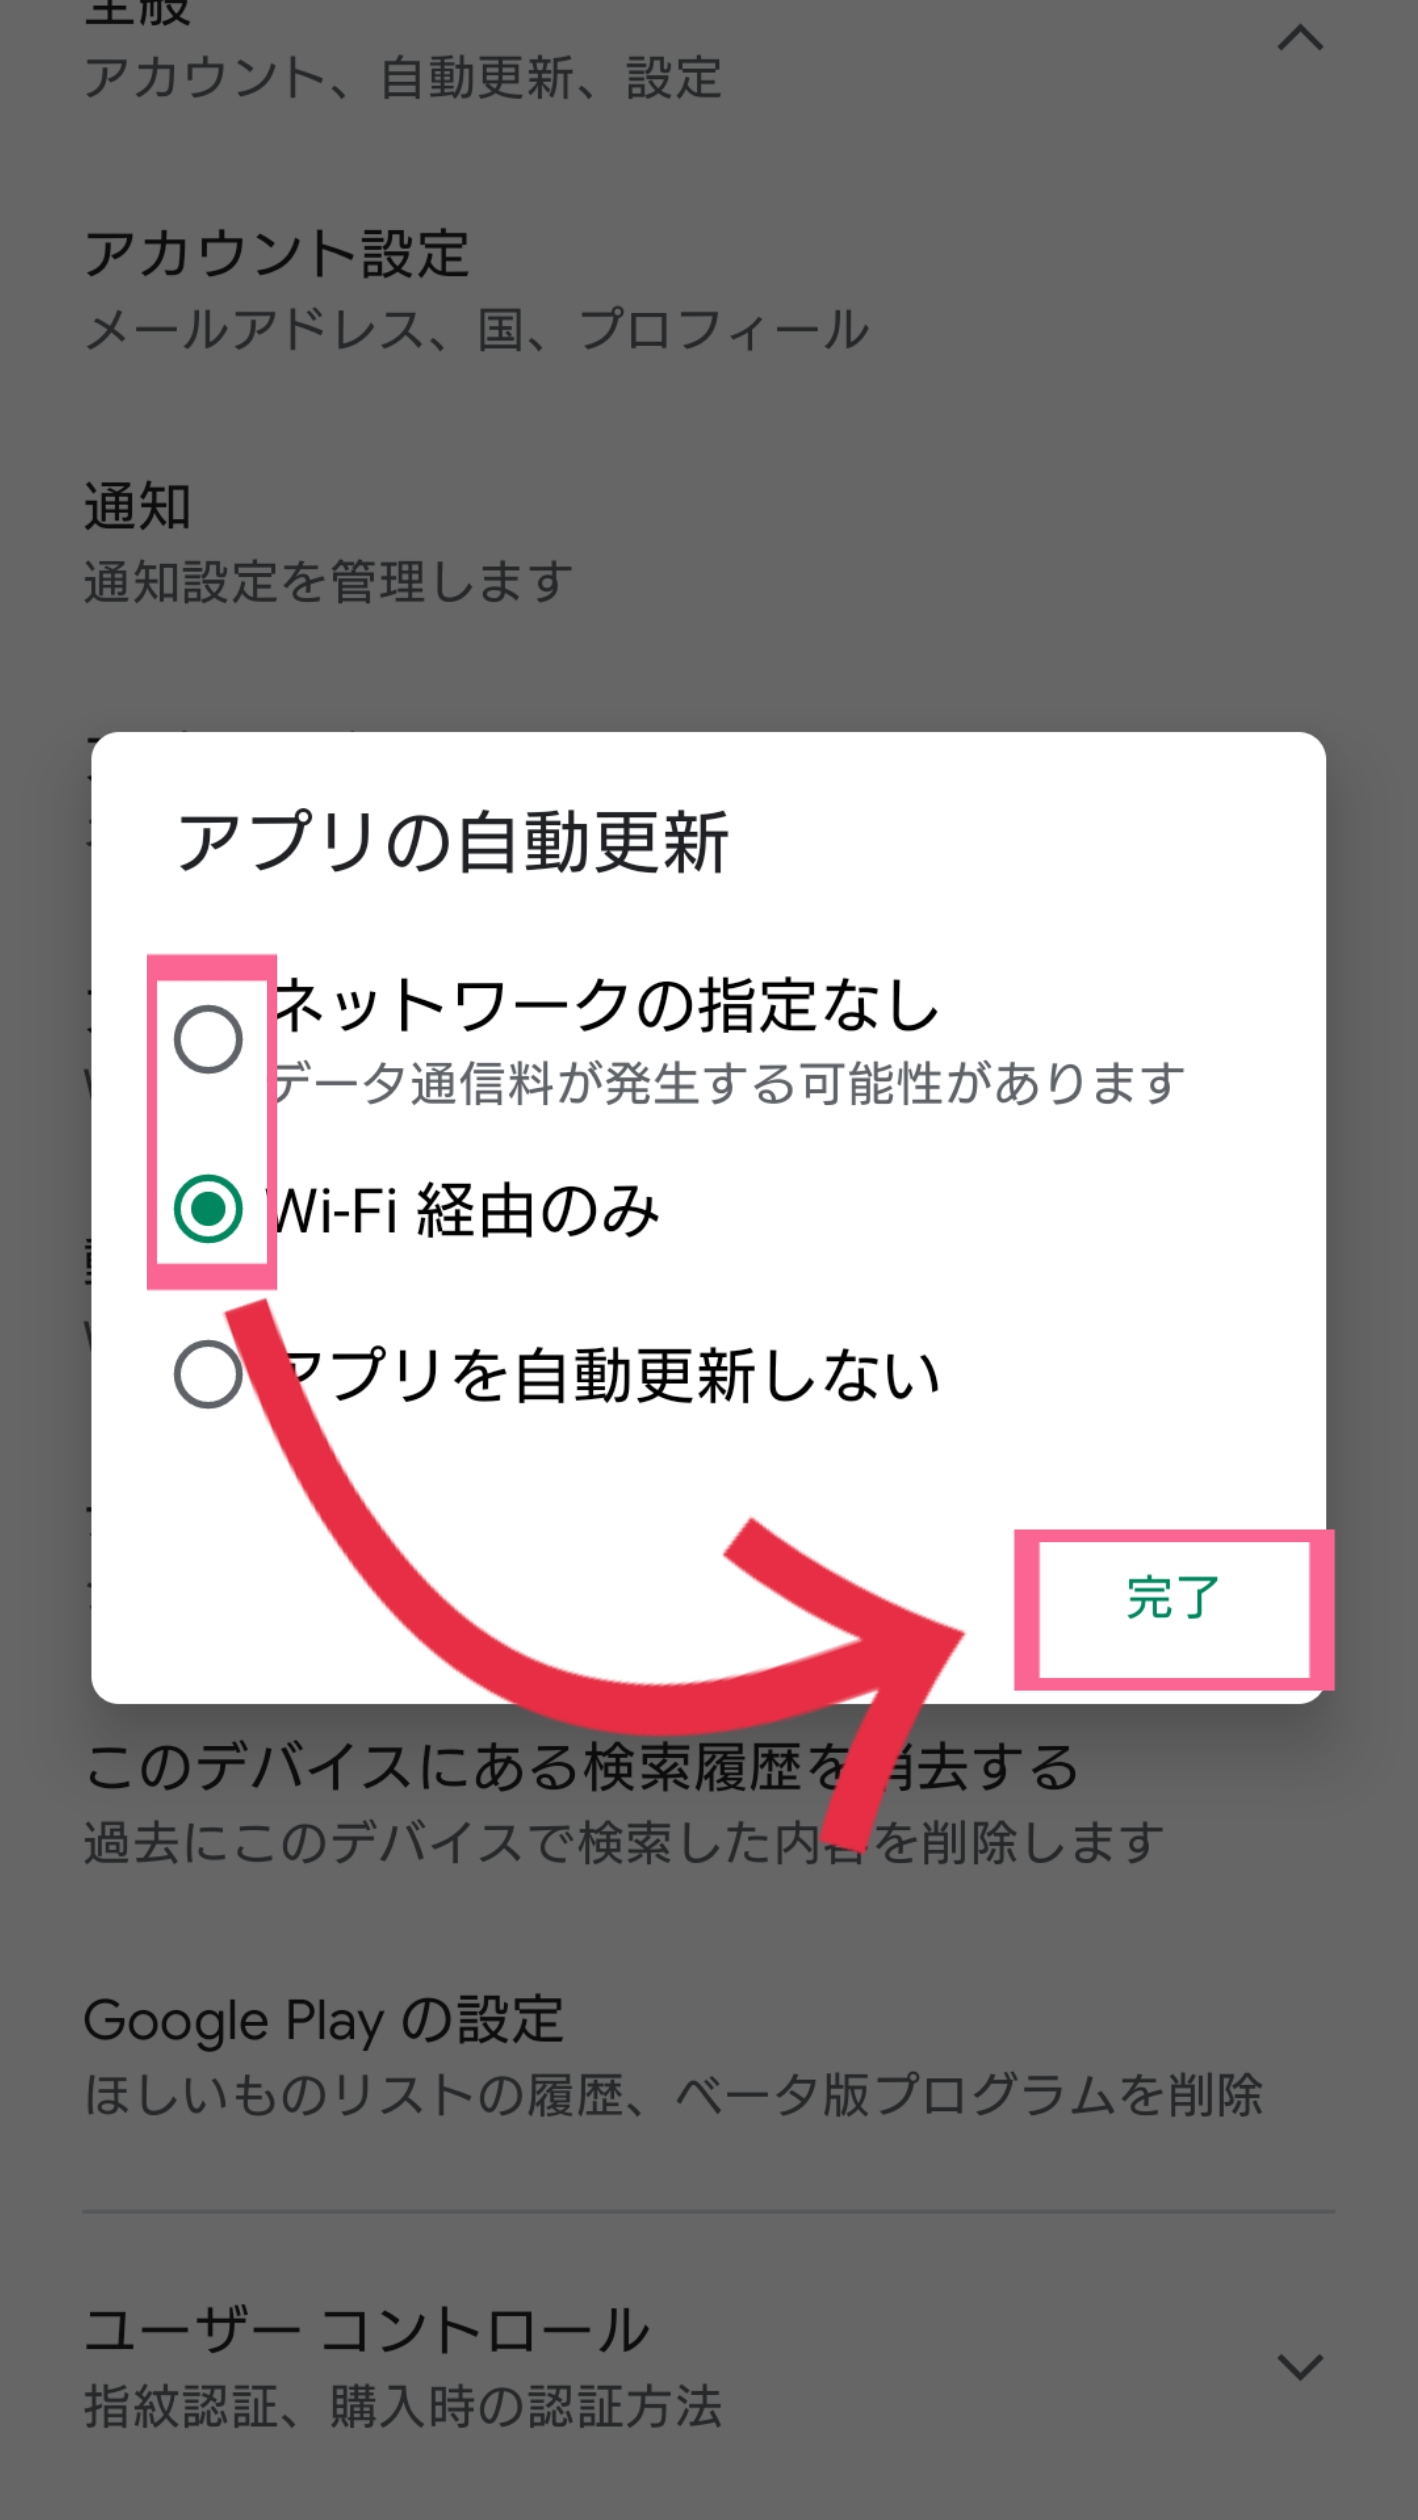 Instagram アプリ 設定 アプリの自動更新 ネットワークの指定なし Wi-Fi経由のみ チェック 完了